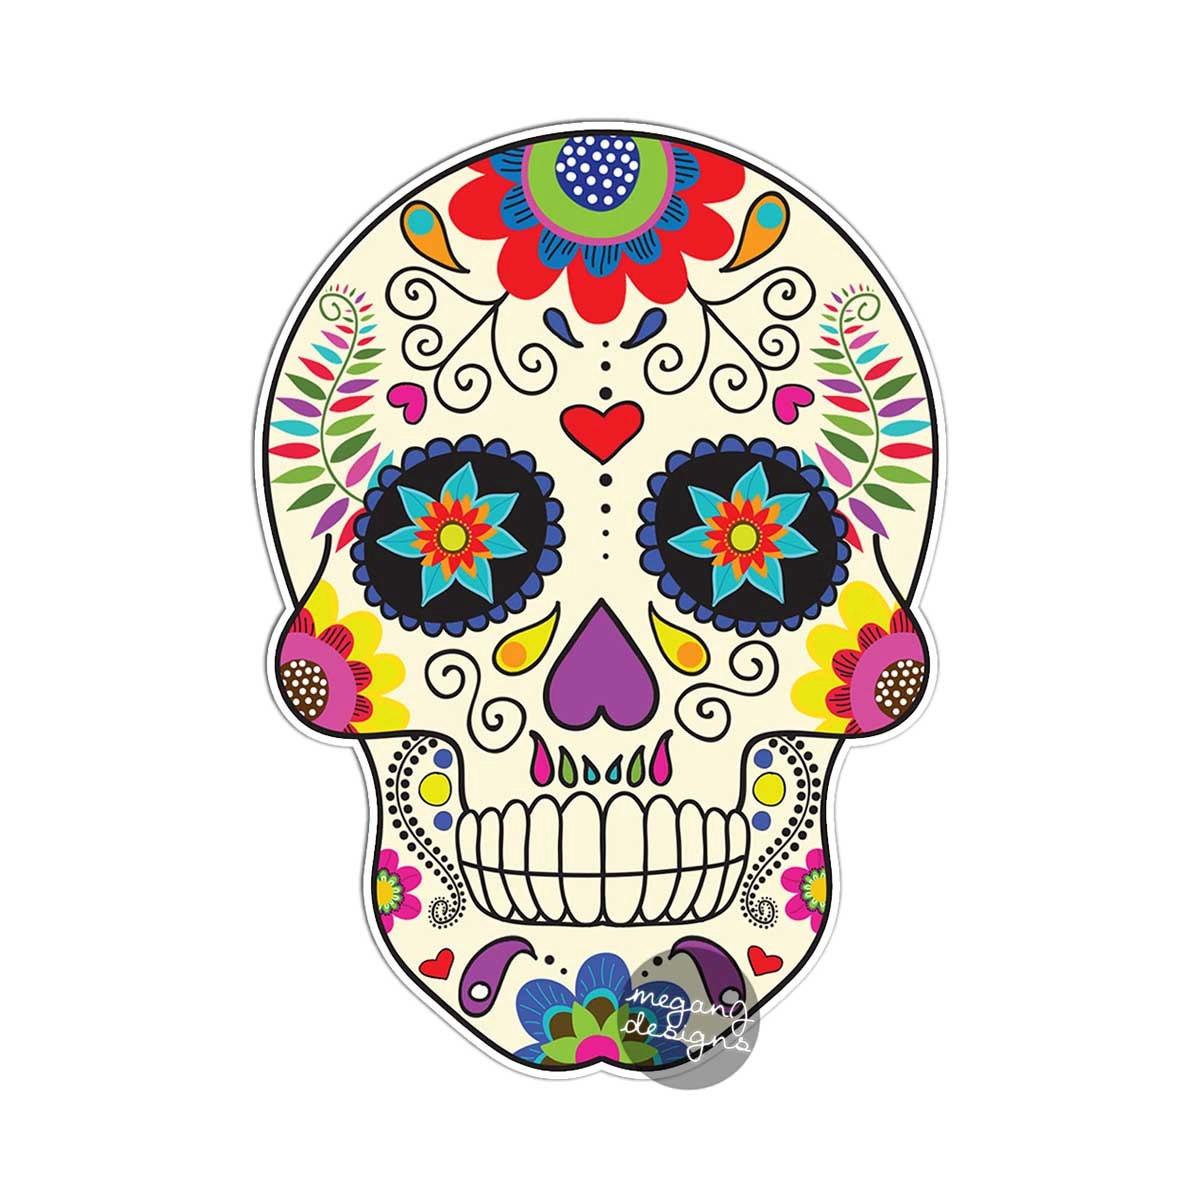 Flower Sugar Skull Art Popular Items For On Etsy